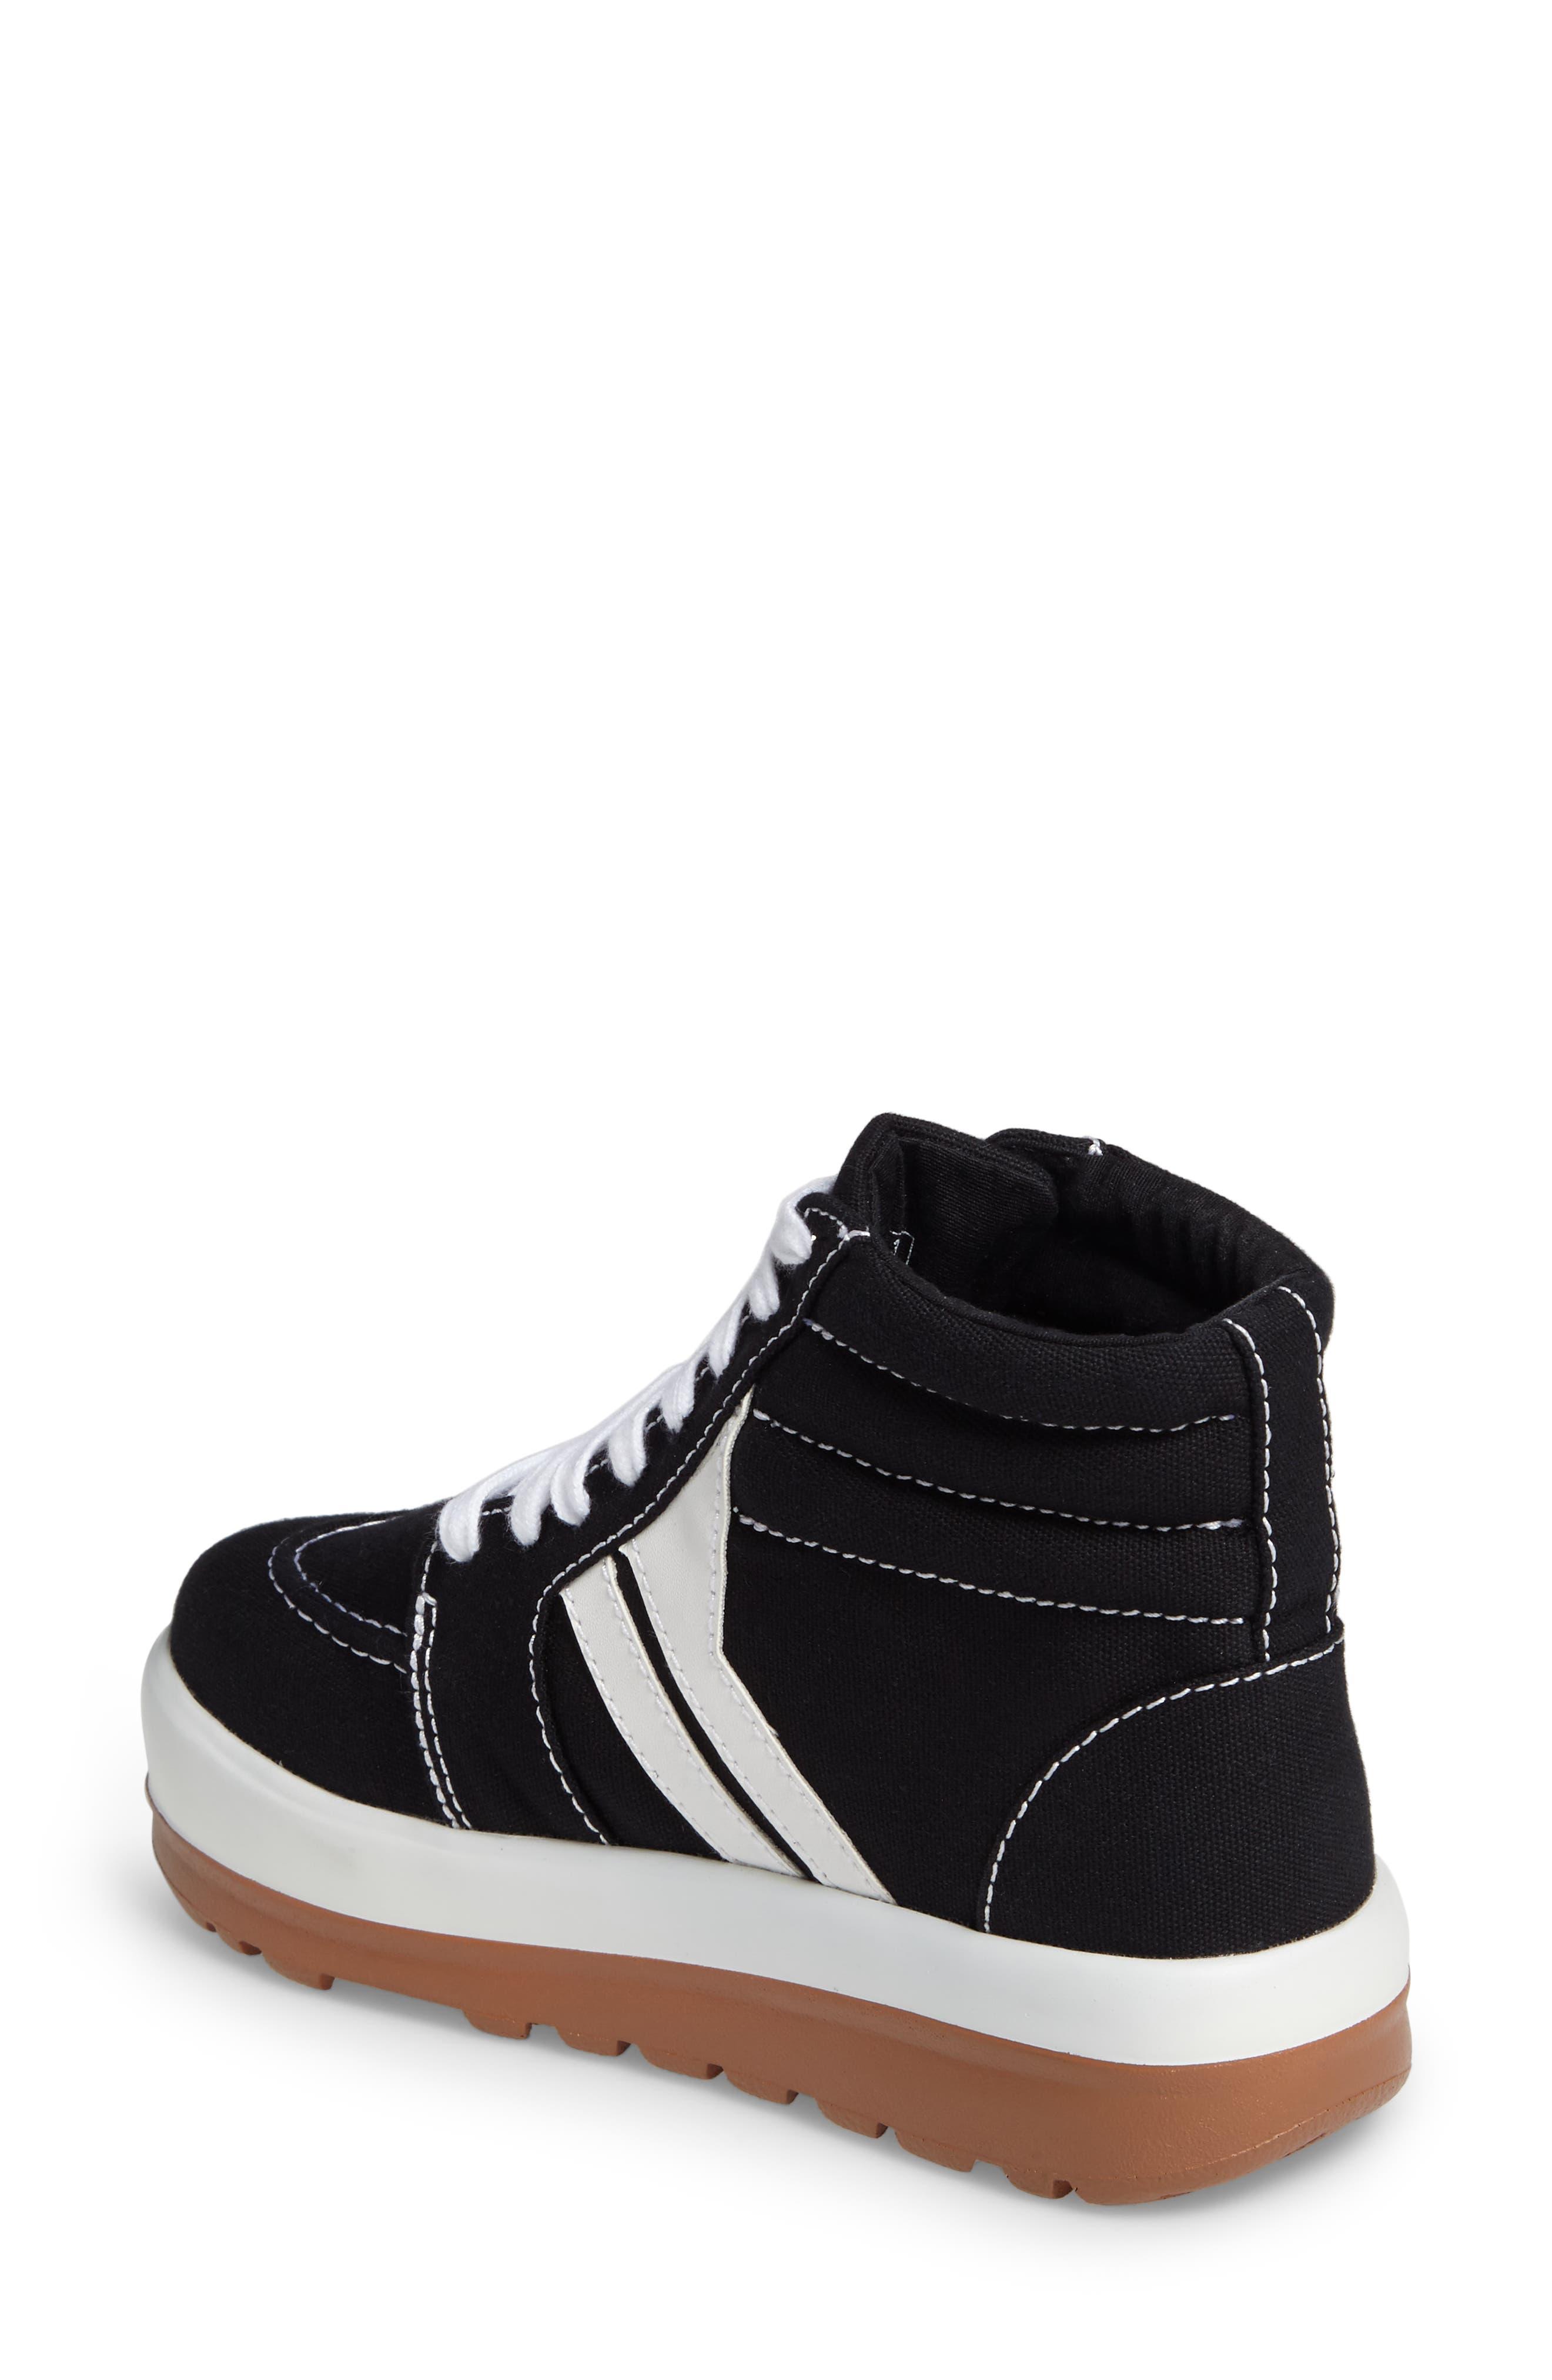 Alternate Image 2  - Jeffrey Campbell Grind High Top Sneaker (Women)